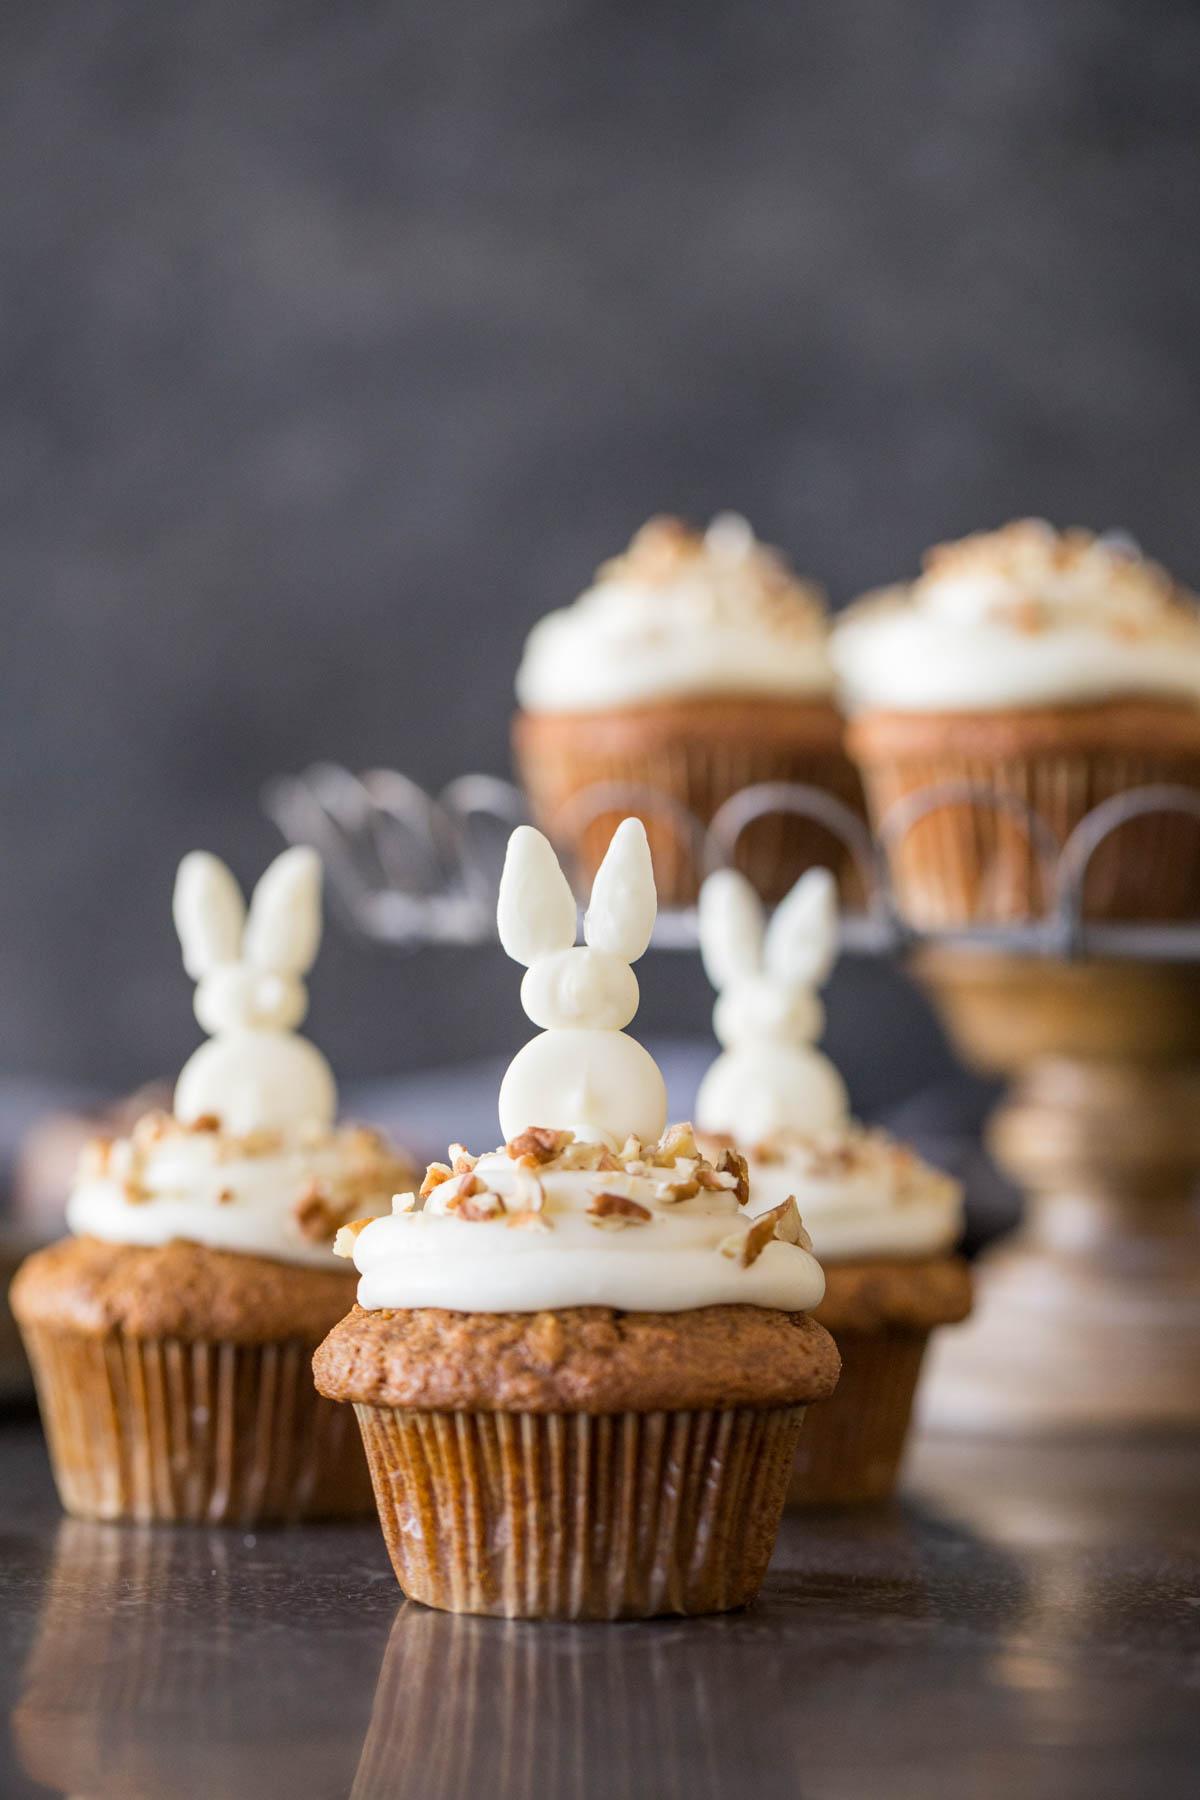 Nut Free Carrot Cake Cupcakes